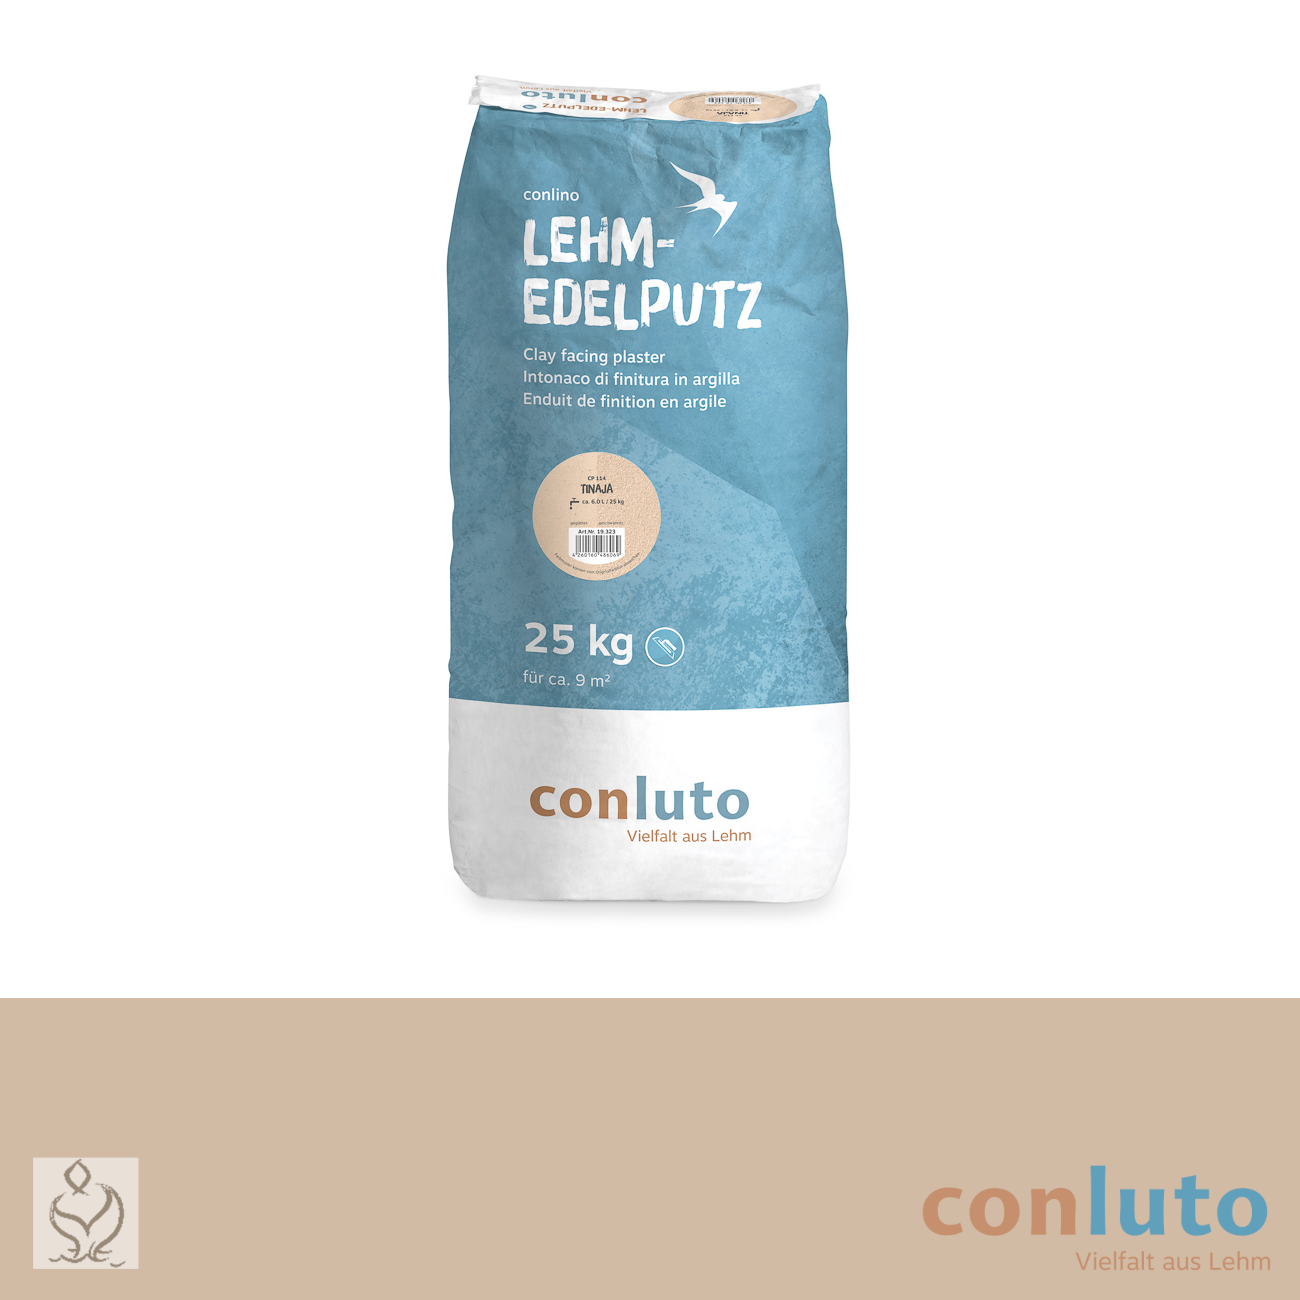 conluto Lehm Edelputz · Tinaja · CP114